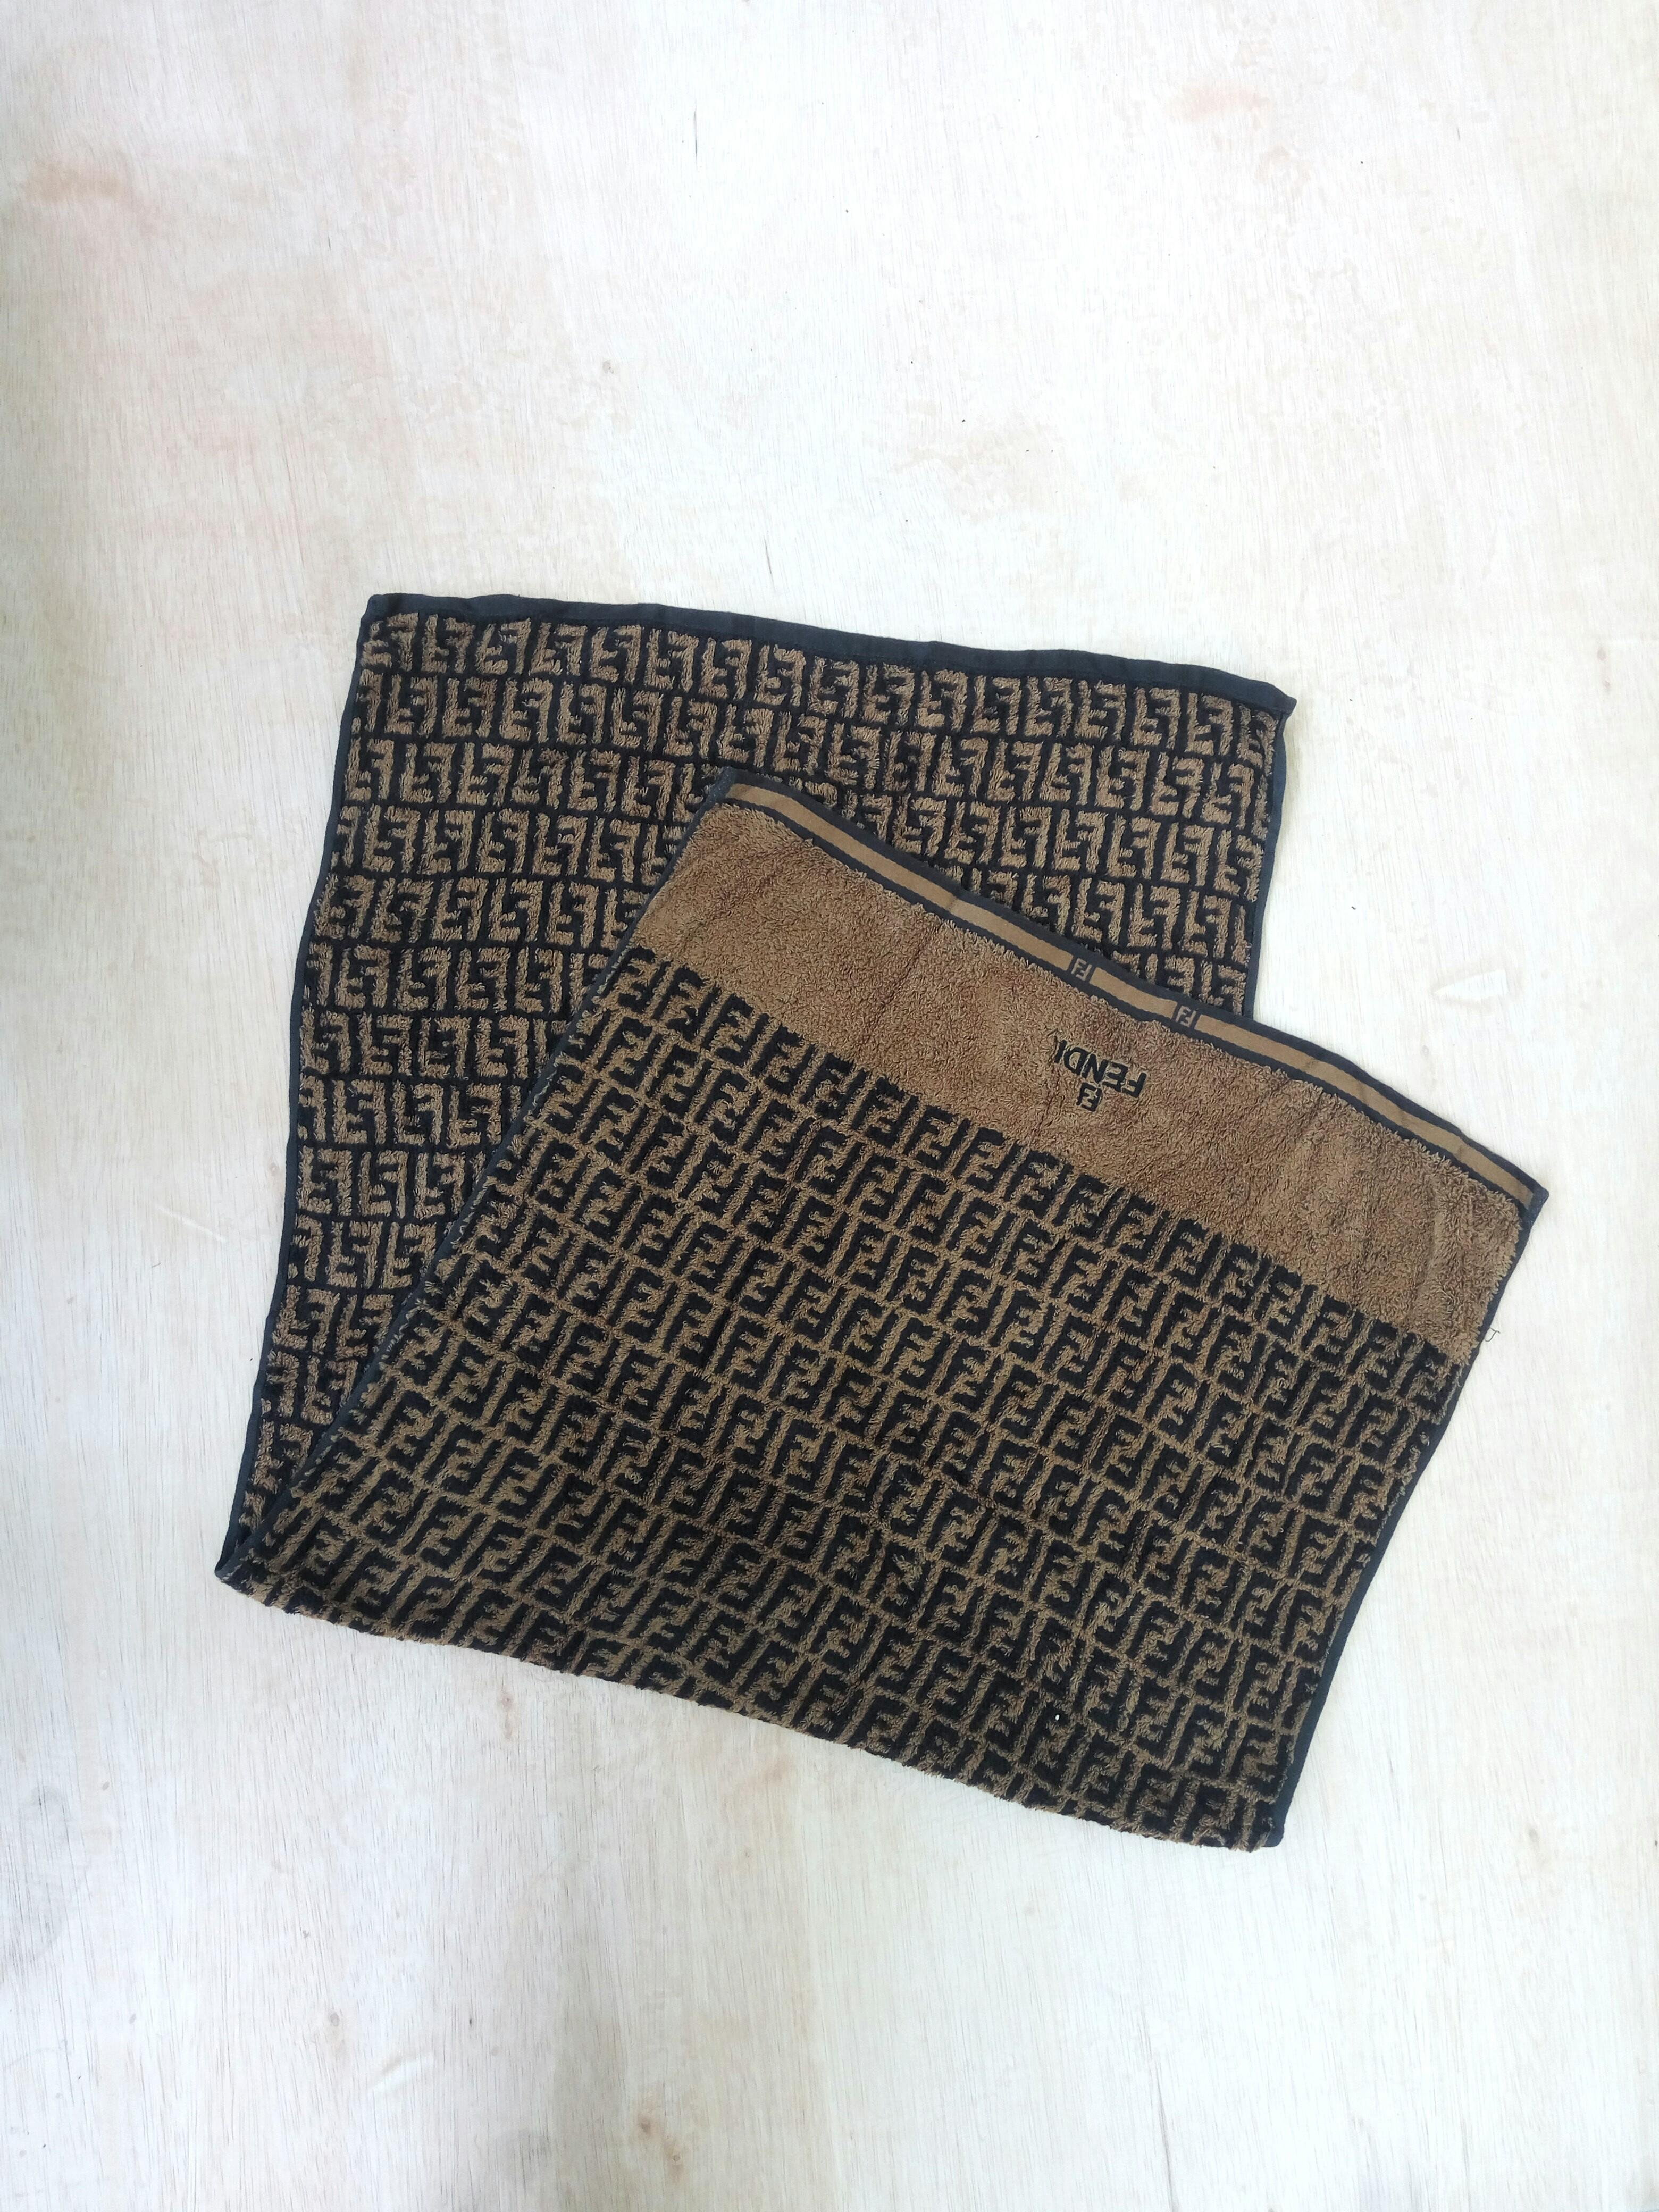 fendi towel